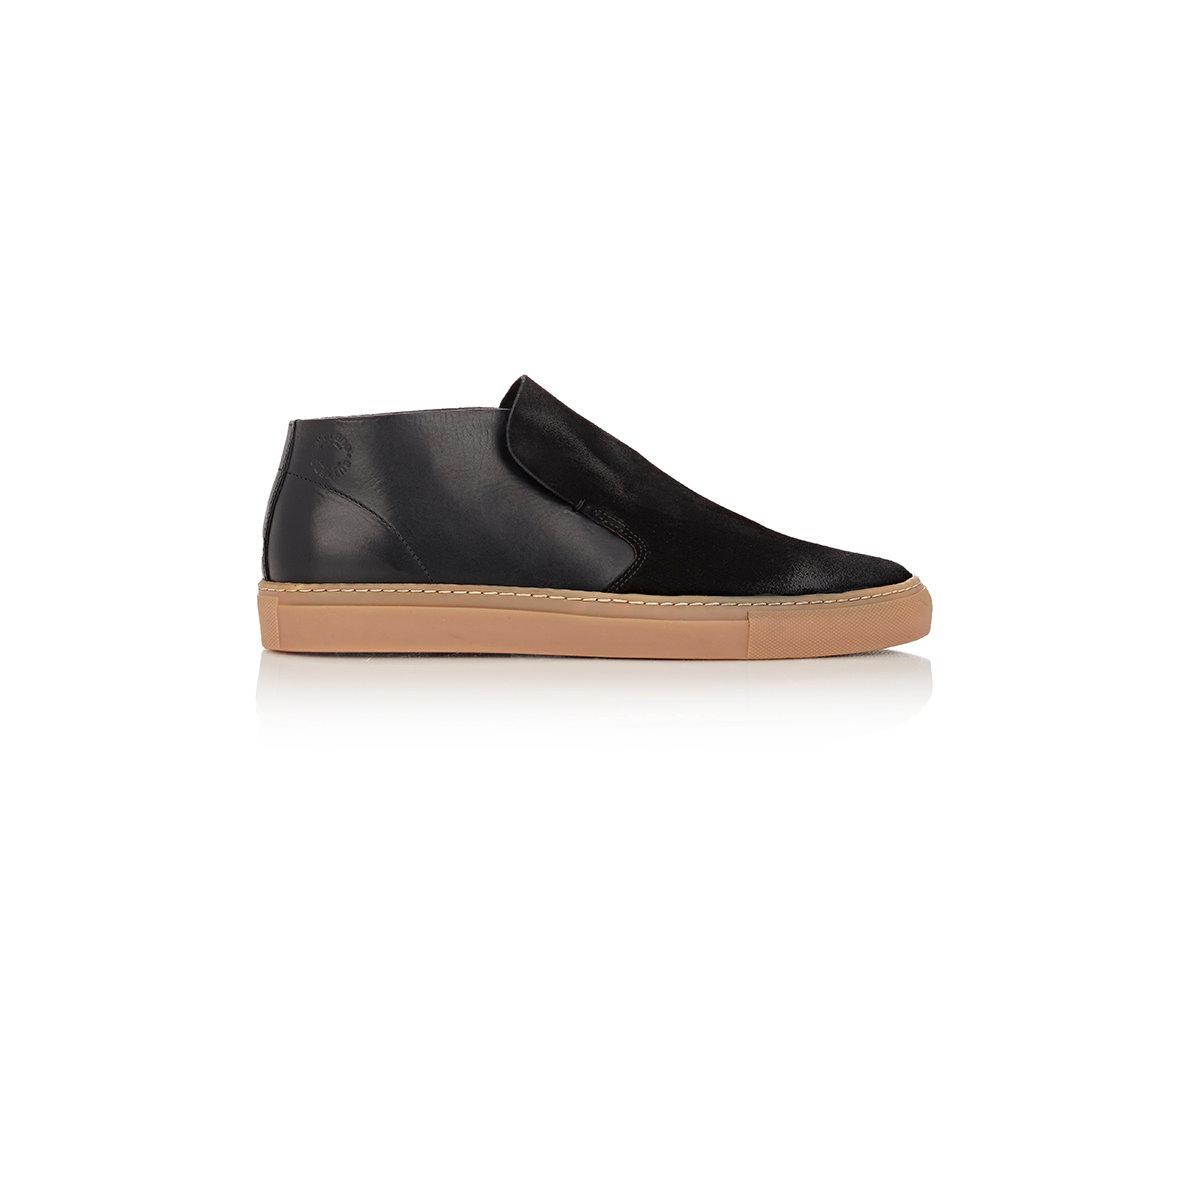 Buttero slip-on sneakers 2014 unisex online outlet marketable szUBi